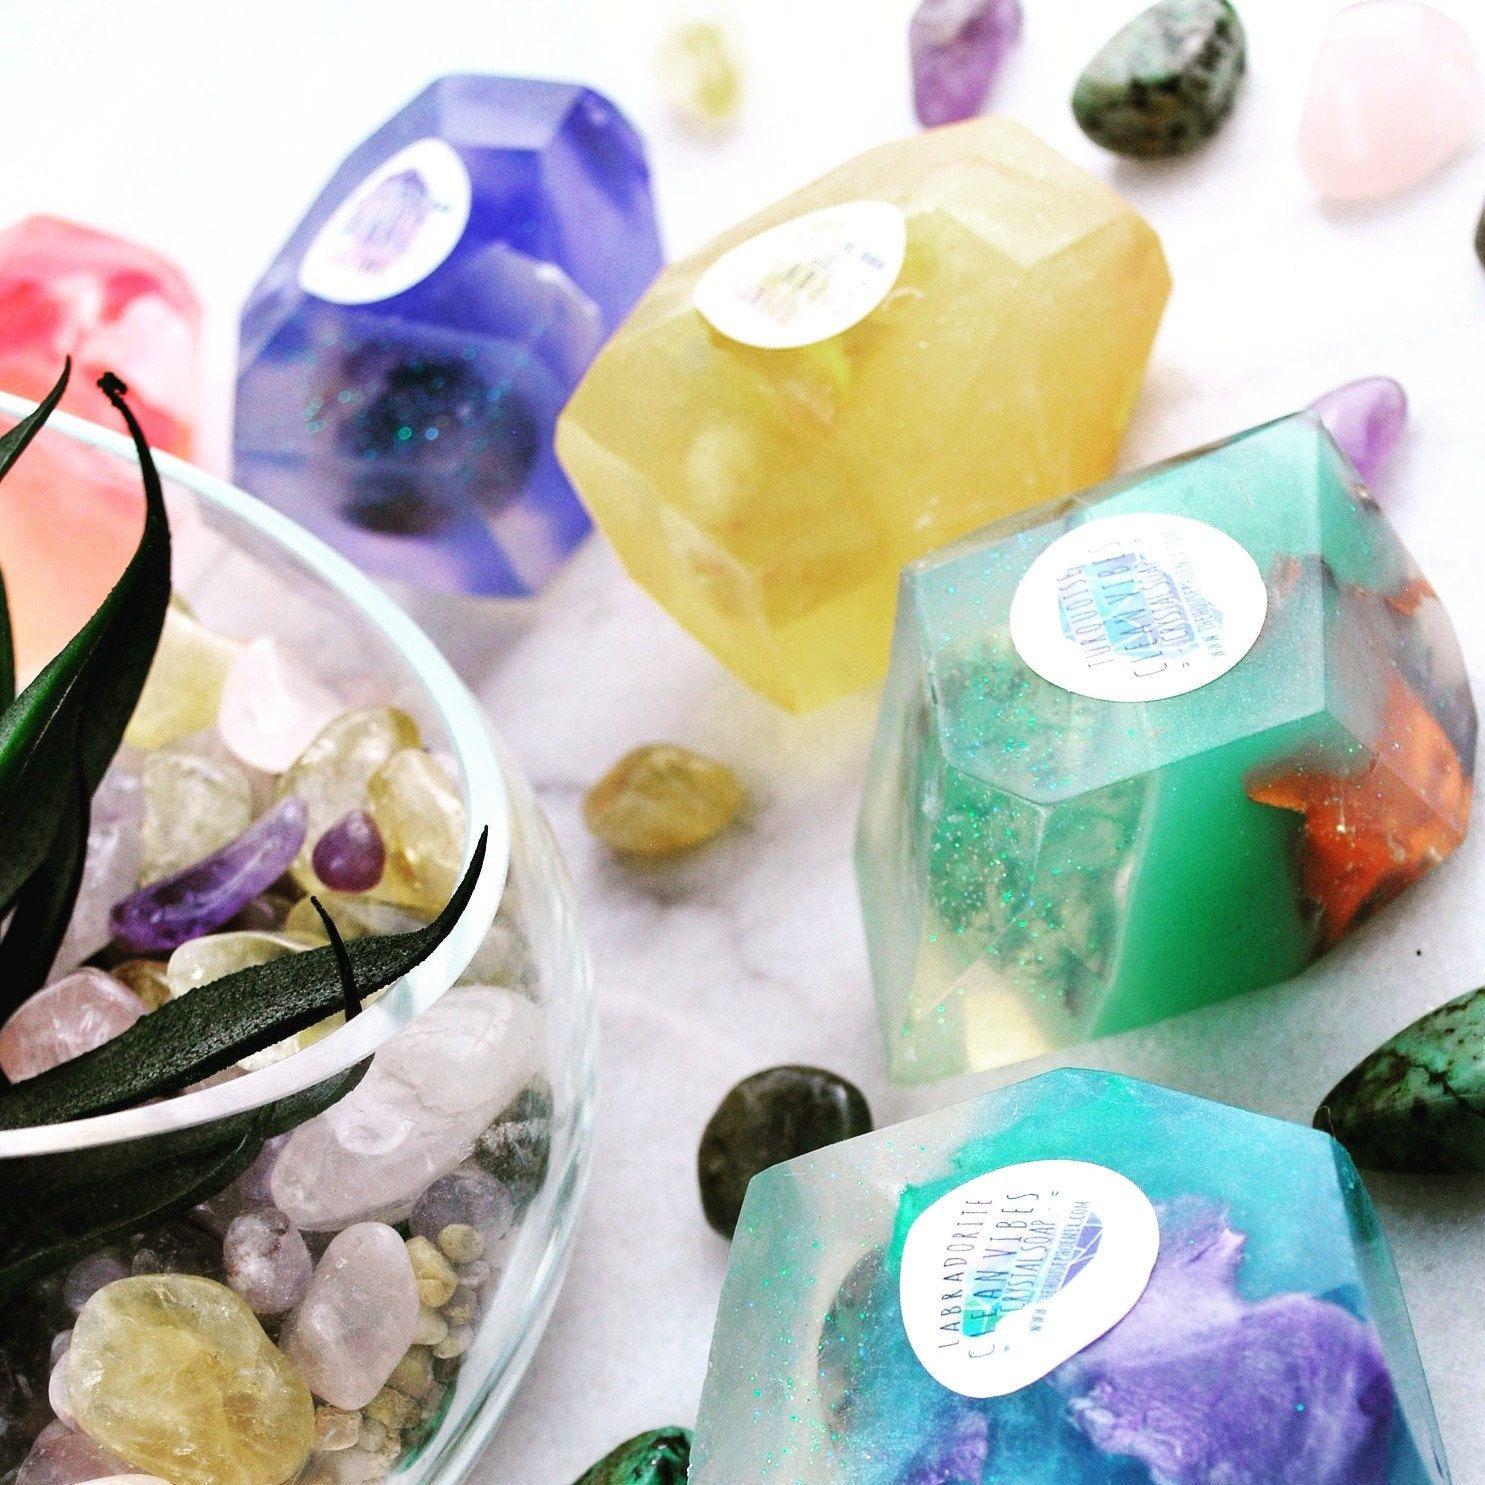 Choose Any 5 Crystal Soaps A Real Crystal in Each Vegan Handmade Bar